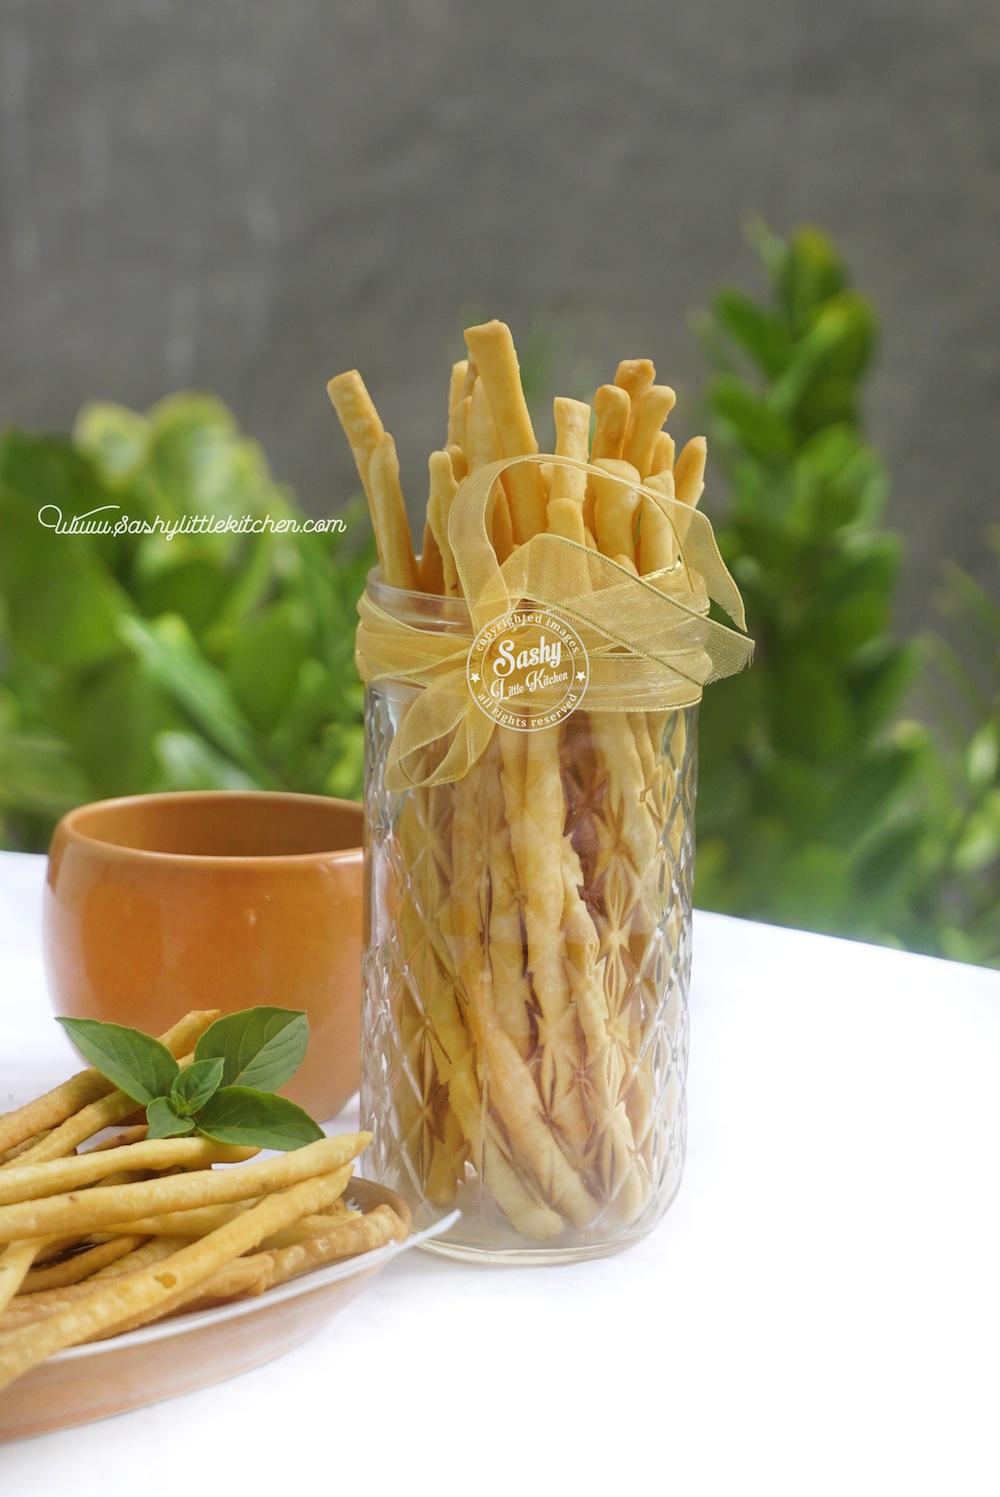 Cheese Stick Bawang Perdana Sashy Little Kitchen Home Cooking Bumbu Rahasia